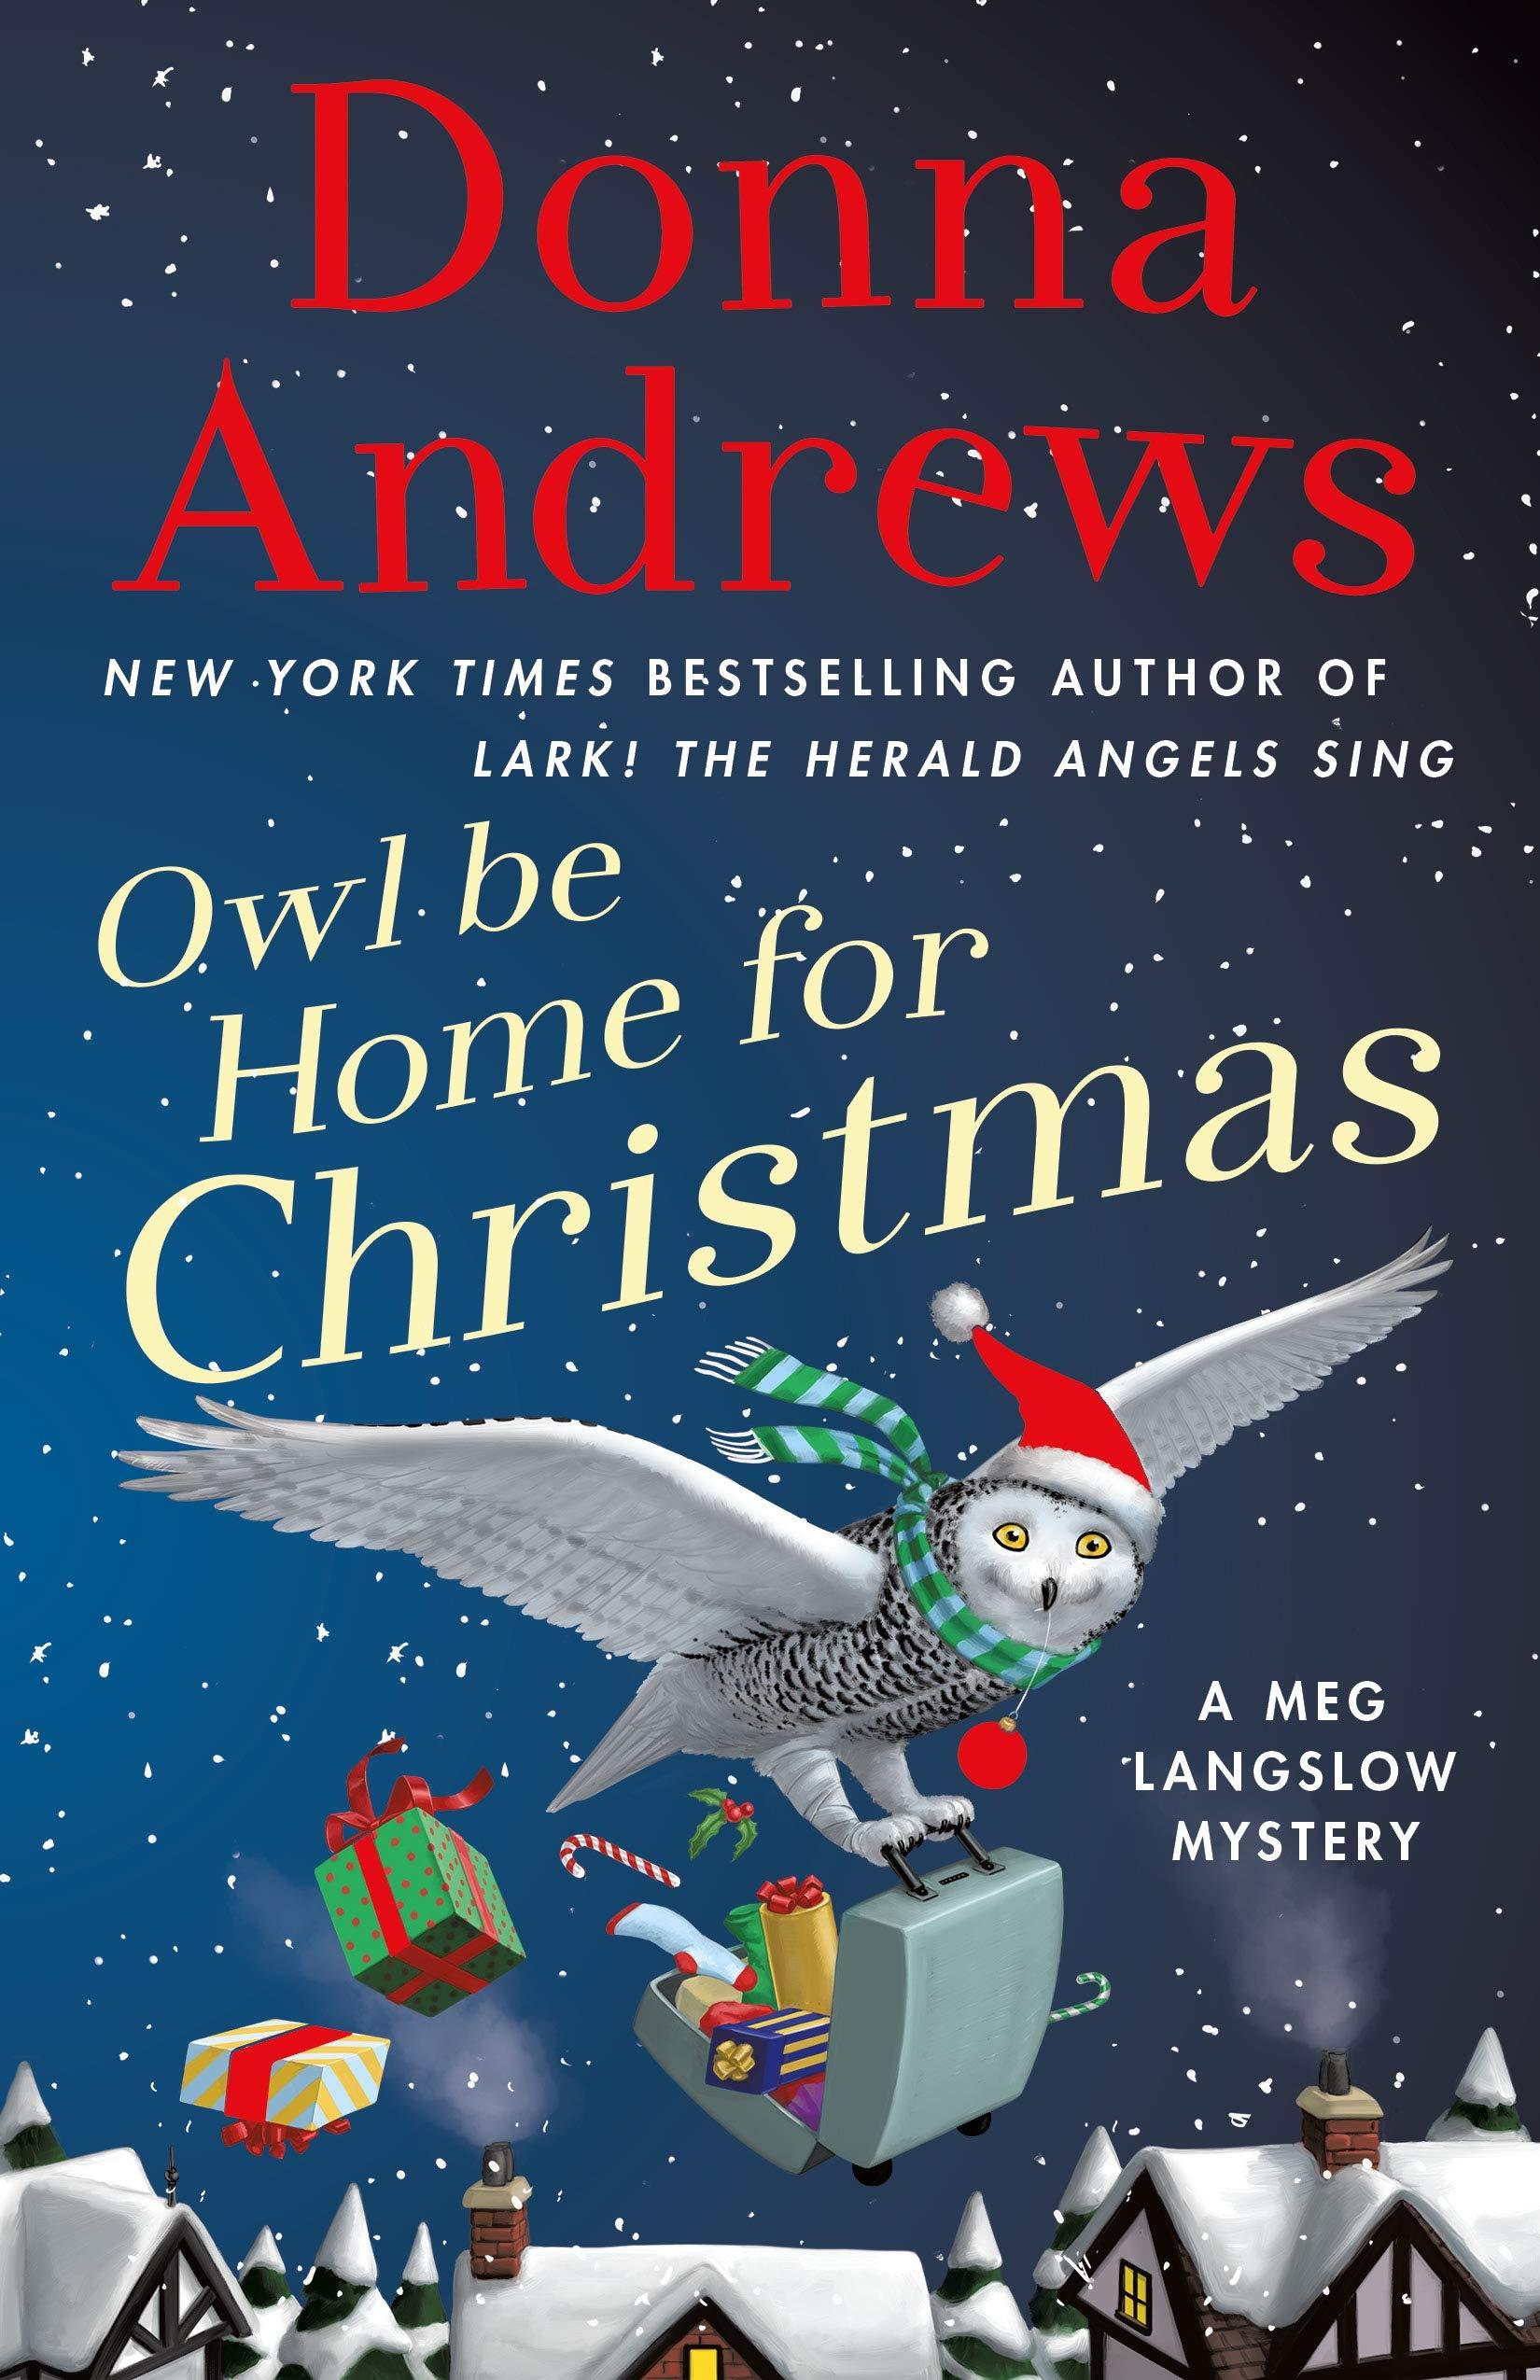 Owl Be Home for Christmas: A Meg Langslow Mystery (Meg Langslow Mysteries) by Minotaur Books